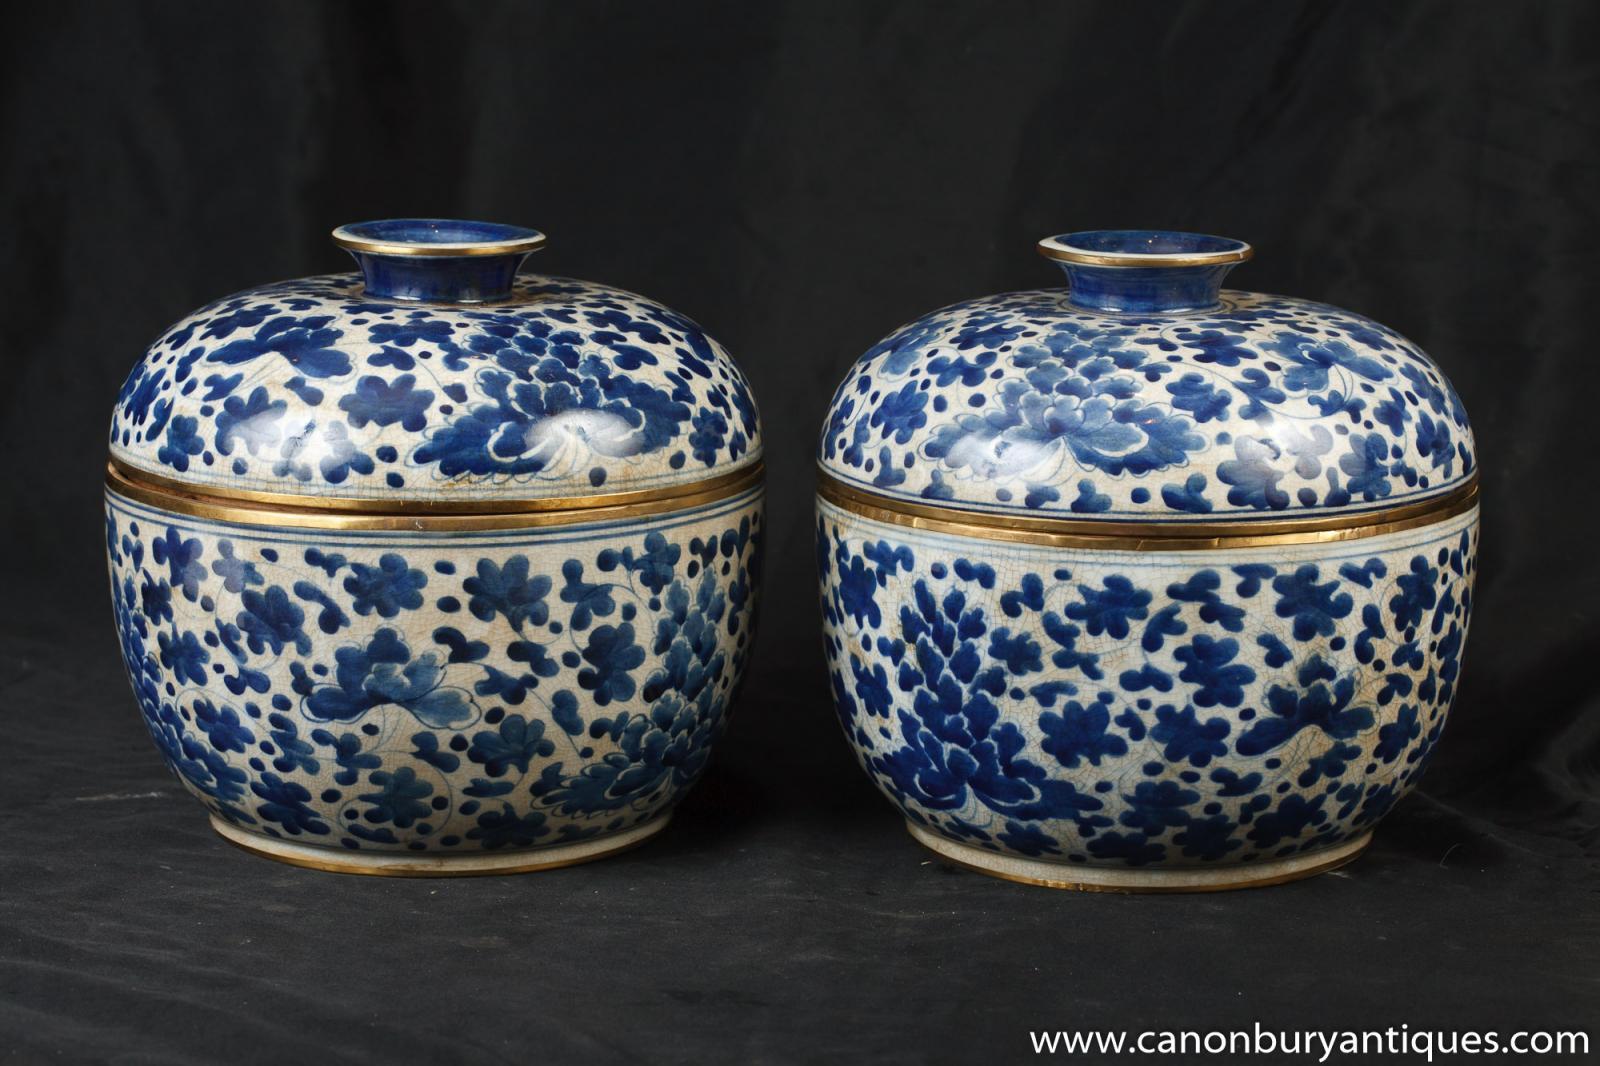 Pair Chinese Kangxi Blue and White Porcelain Lidden Urns  : Pair20Chinese20Kangxi20Blue20and20White20Porcelain20Lidden20Urns20Pots 1401824253 zoom 17 from www.ebay.co.uk size 1600 x 1066 jpeg 196kB